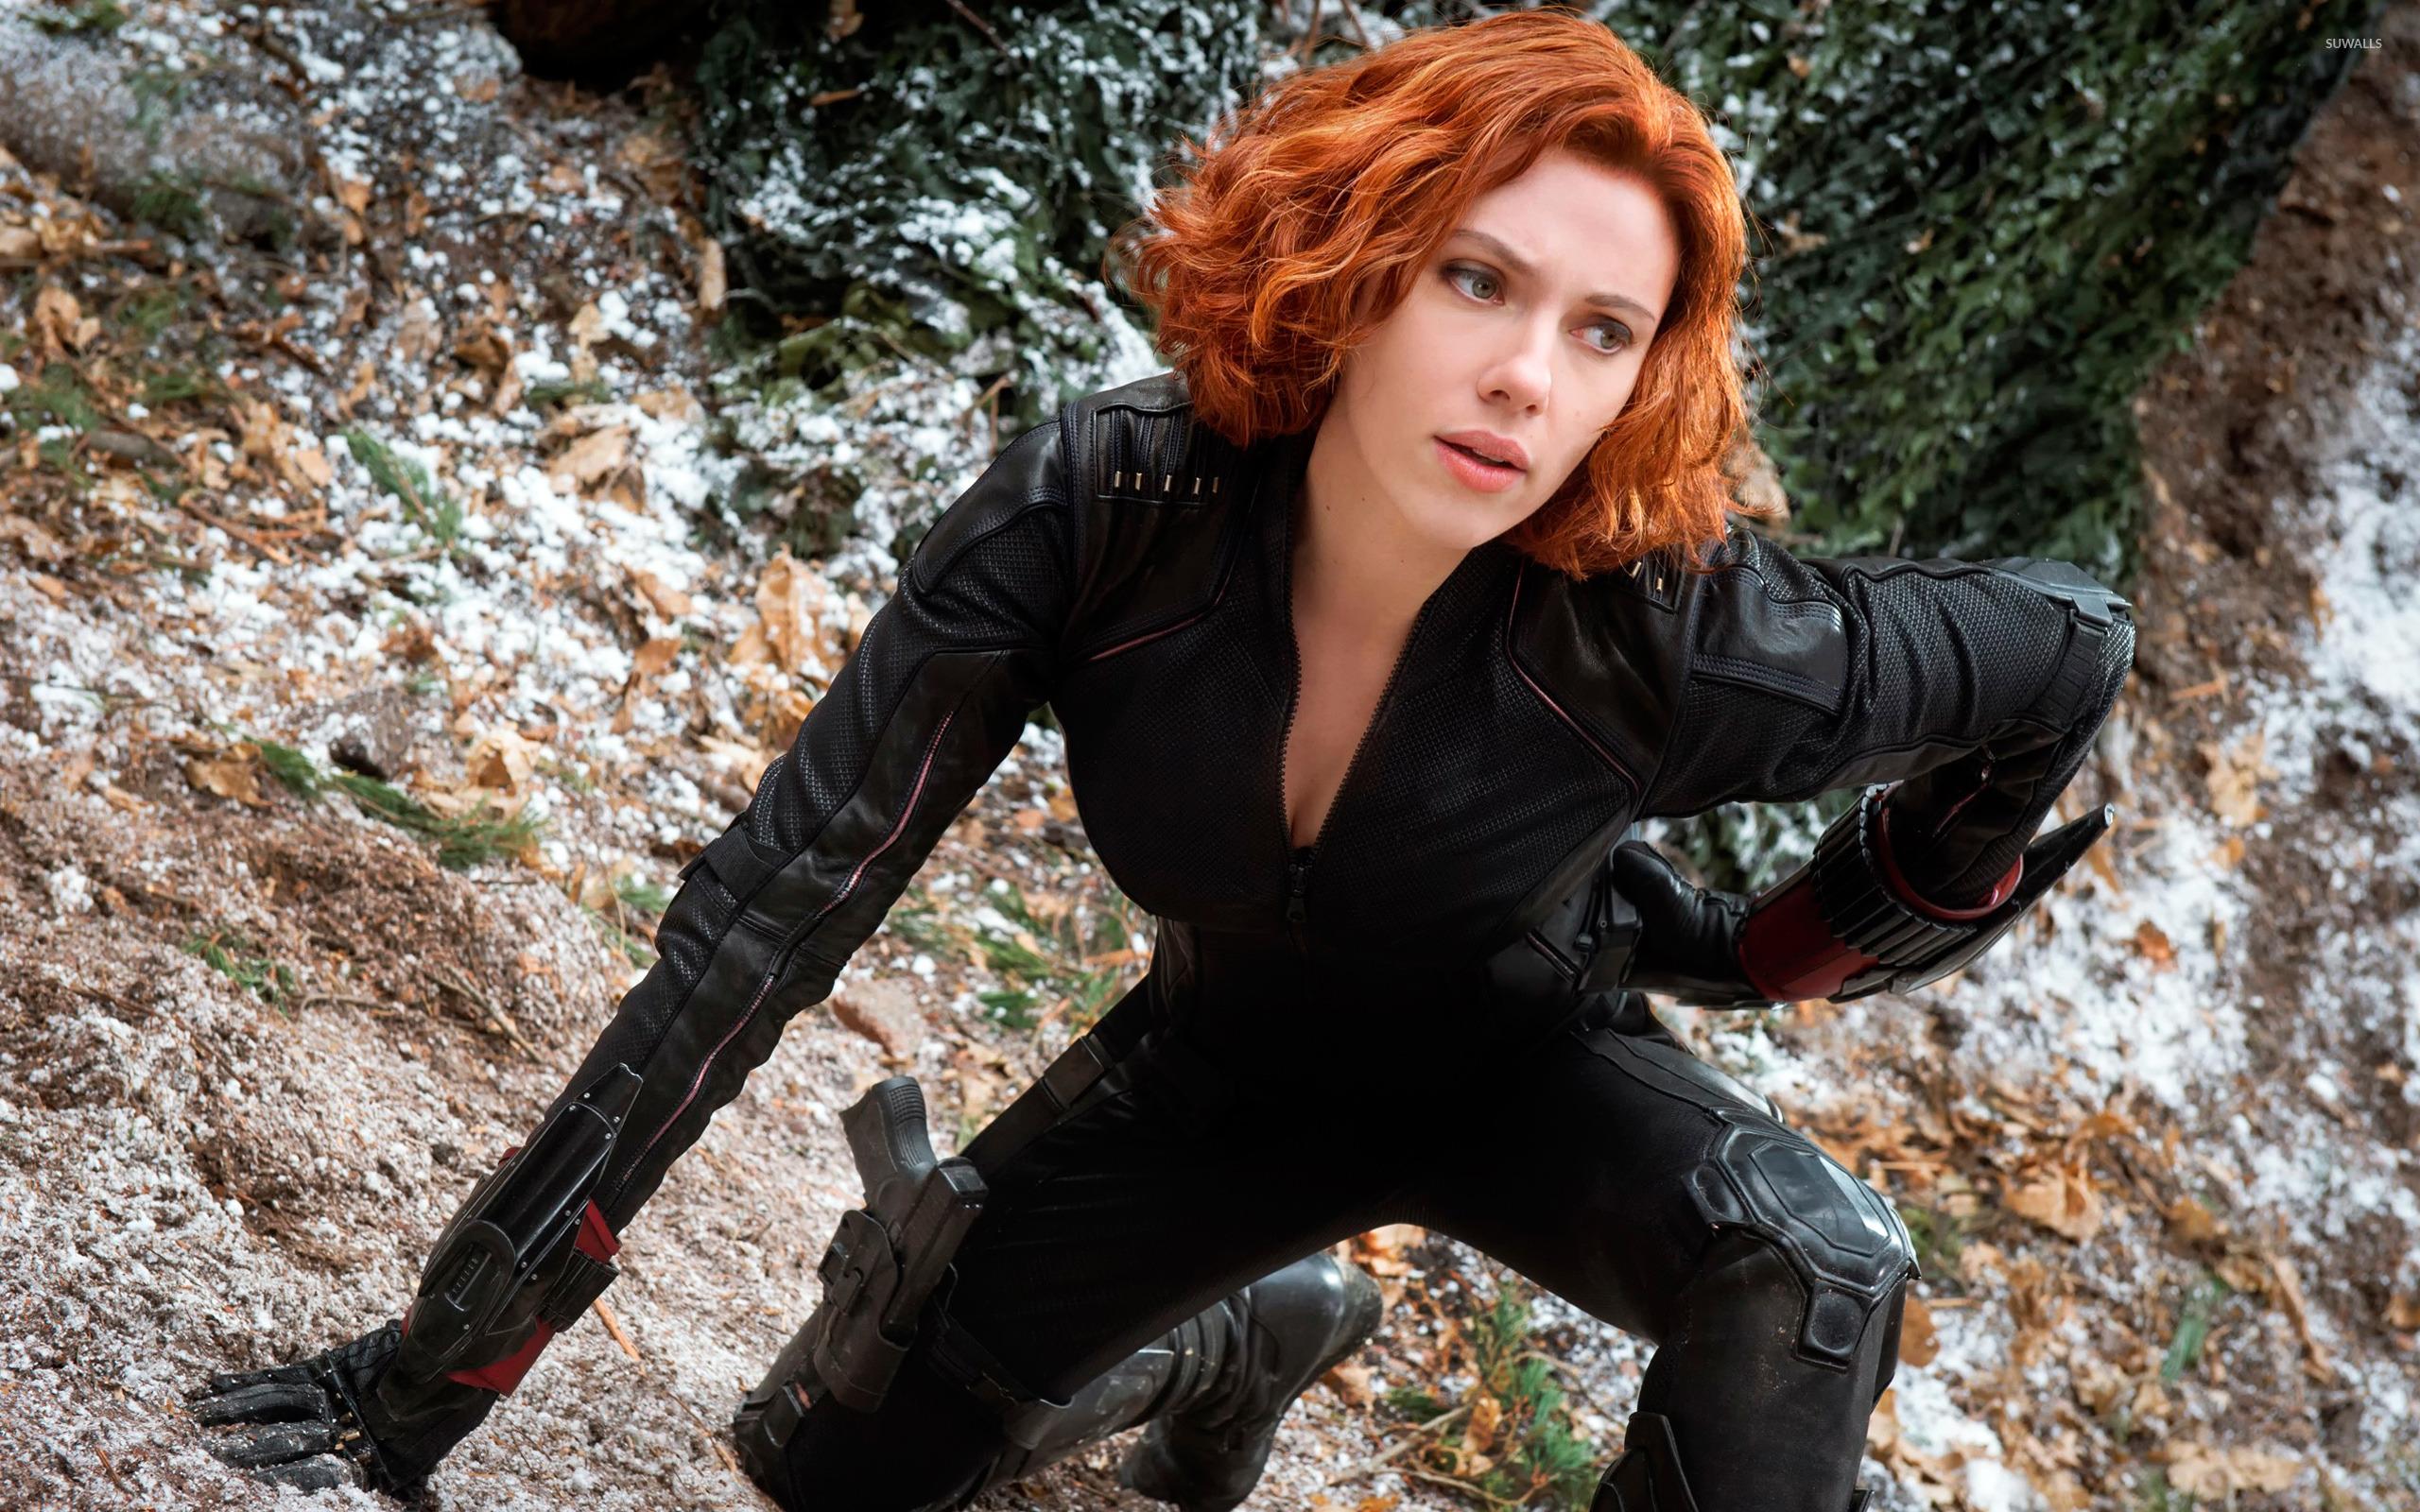 Black Widow Avengers Age Of Ultron Wallpaper Movie Wallpapers